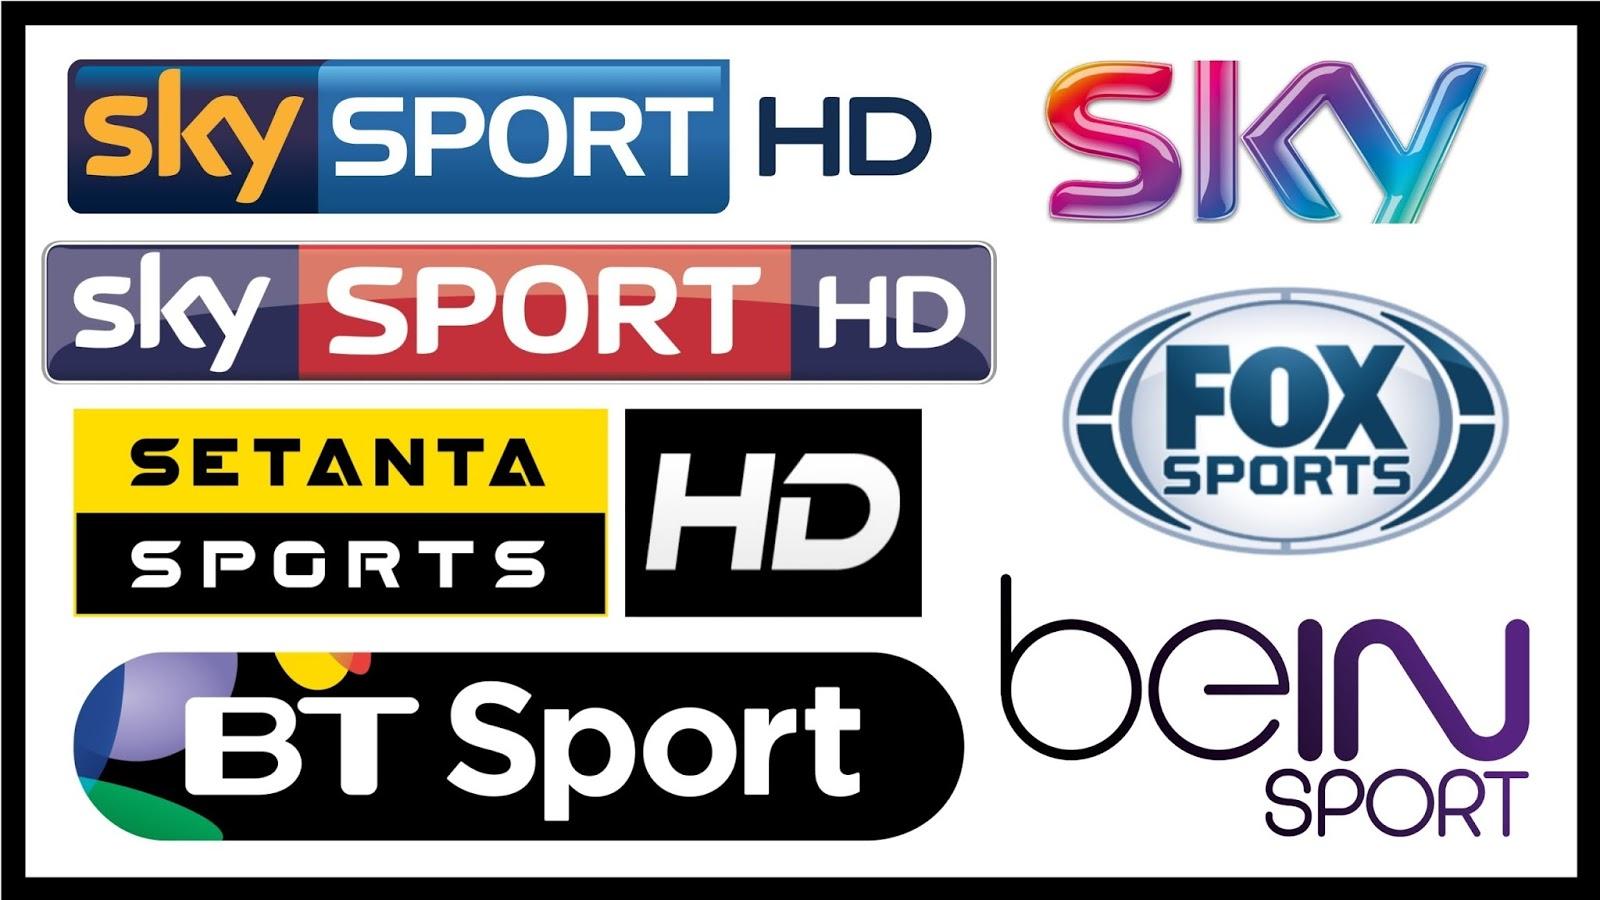 free iptv sports world m3u playlist 29-01-2019 - satunivers net